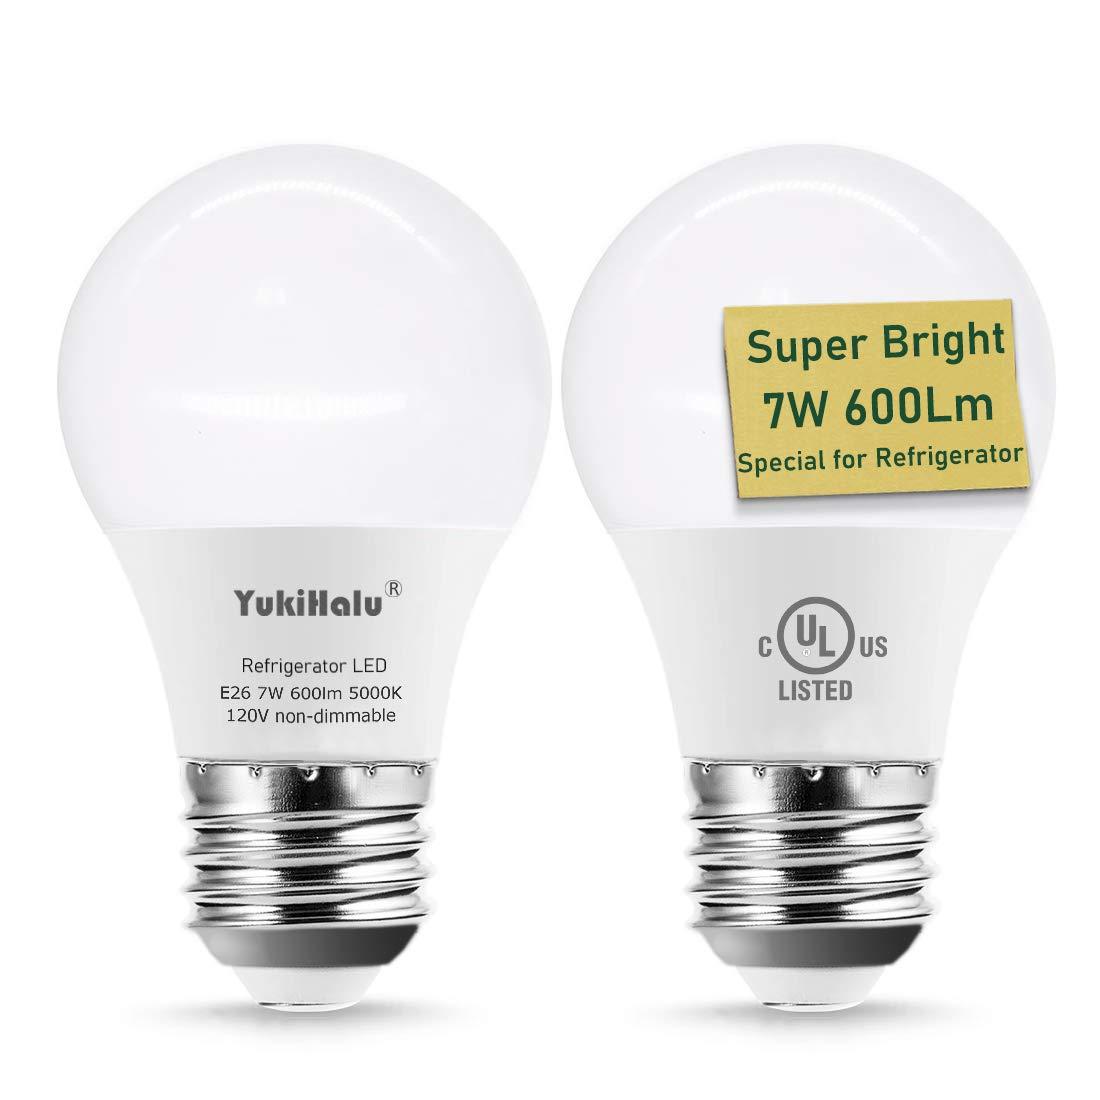 YUKIHALU, LED Refrigerator Light Bulb 40W-60W Equivalent A15 Appliance Fridge Bulbs, Waterproof 600 Lumen 7W 120V Daylight 5000K E26 Medium Base, Small Size Bulb for Damp Location, Not-Dim, 2-Pack